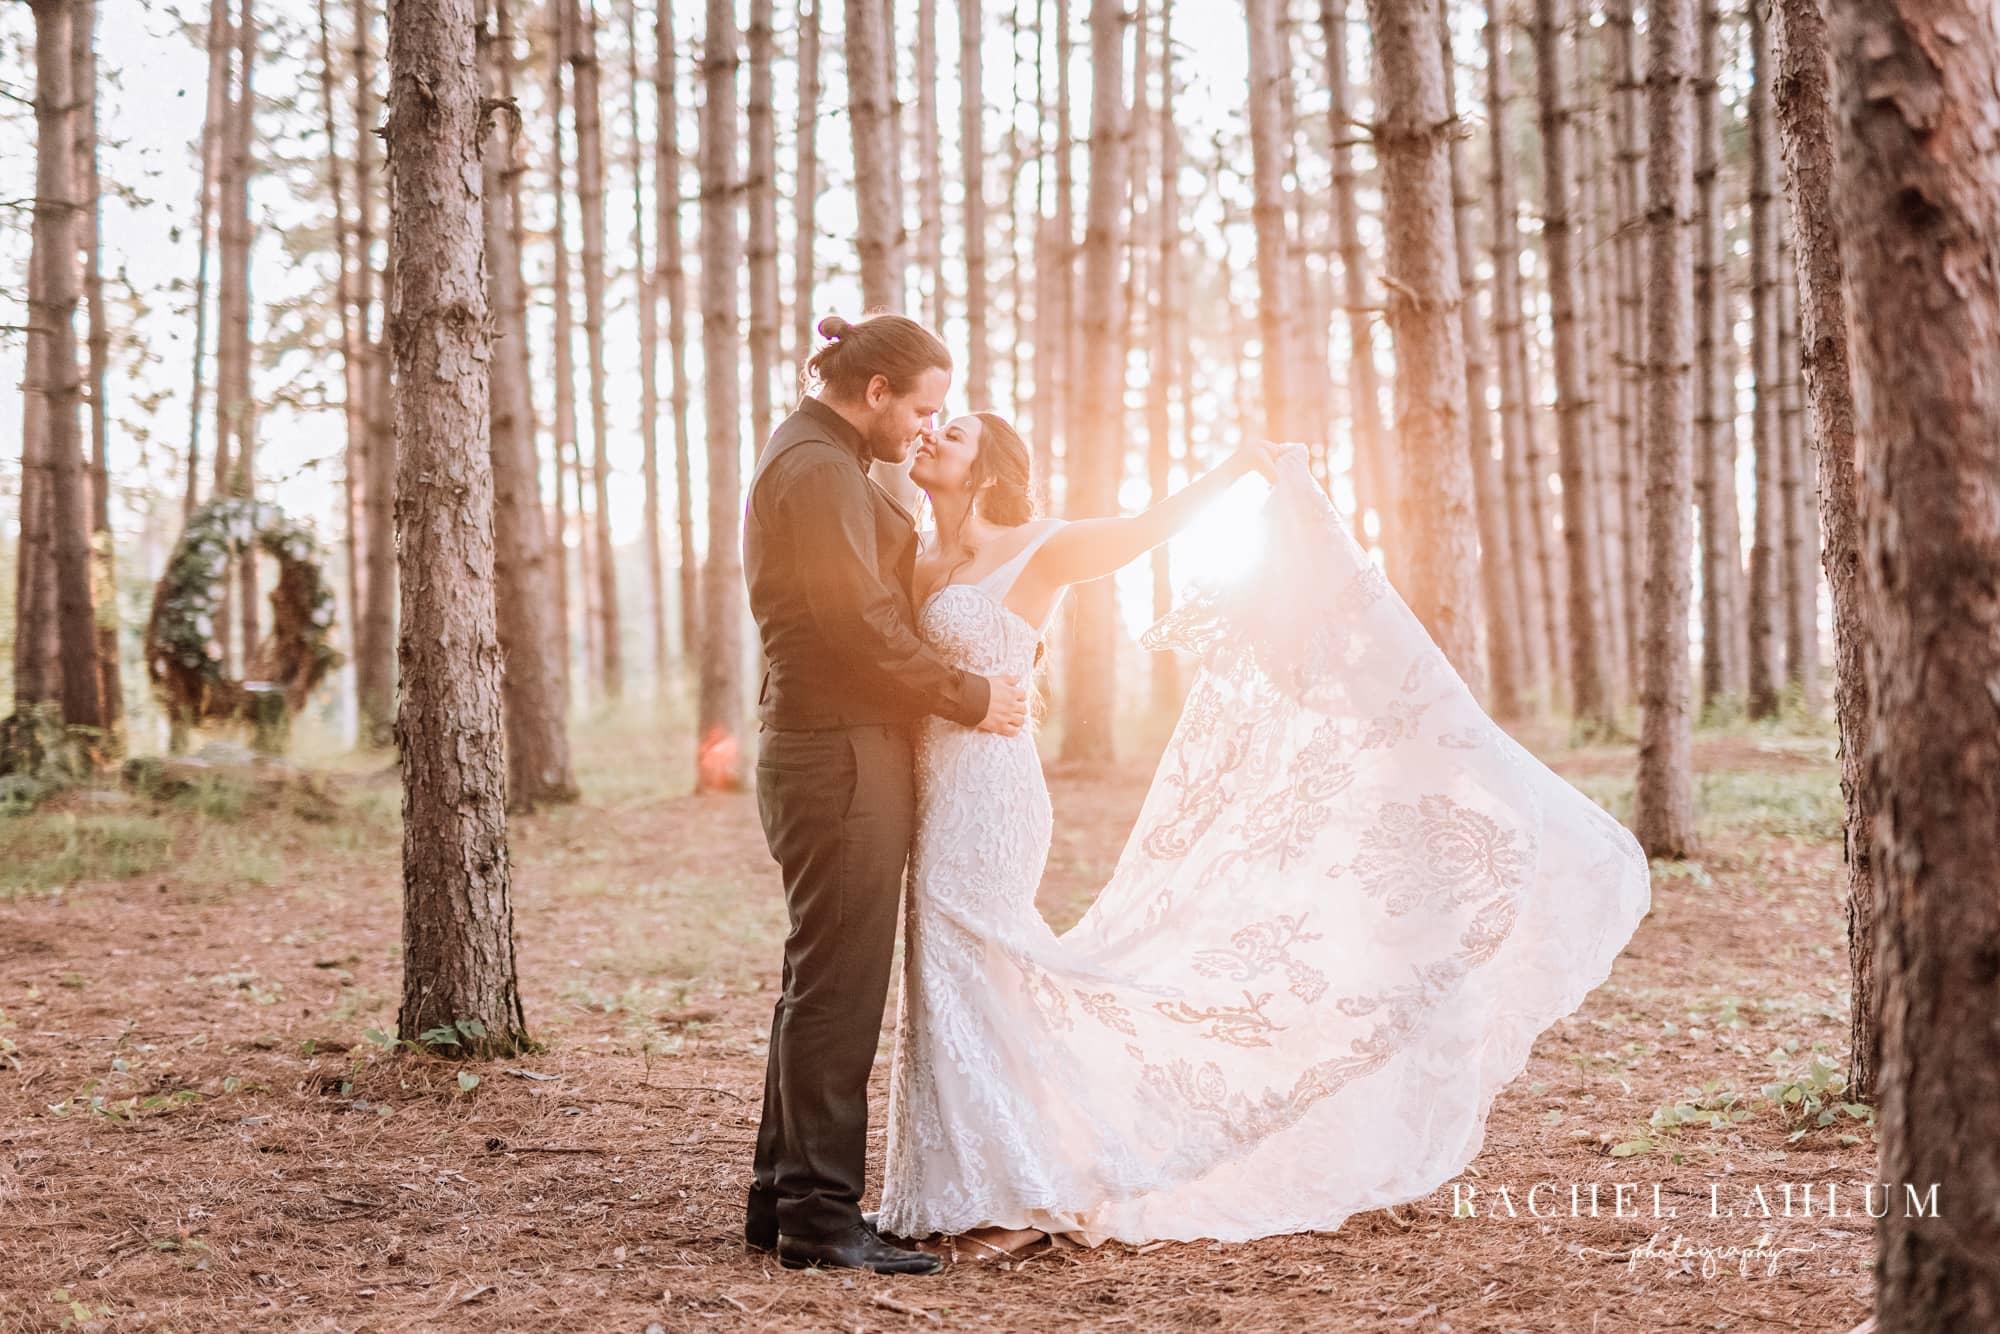 Bride twirls back of dress as she kisses groom in front of the sunset at Wilderness Wedding Barn in Bigfork, Minnesota.